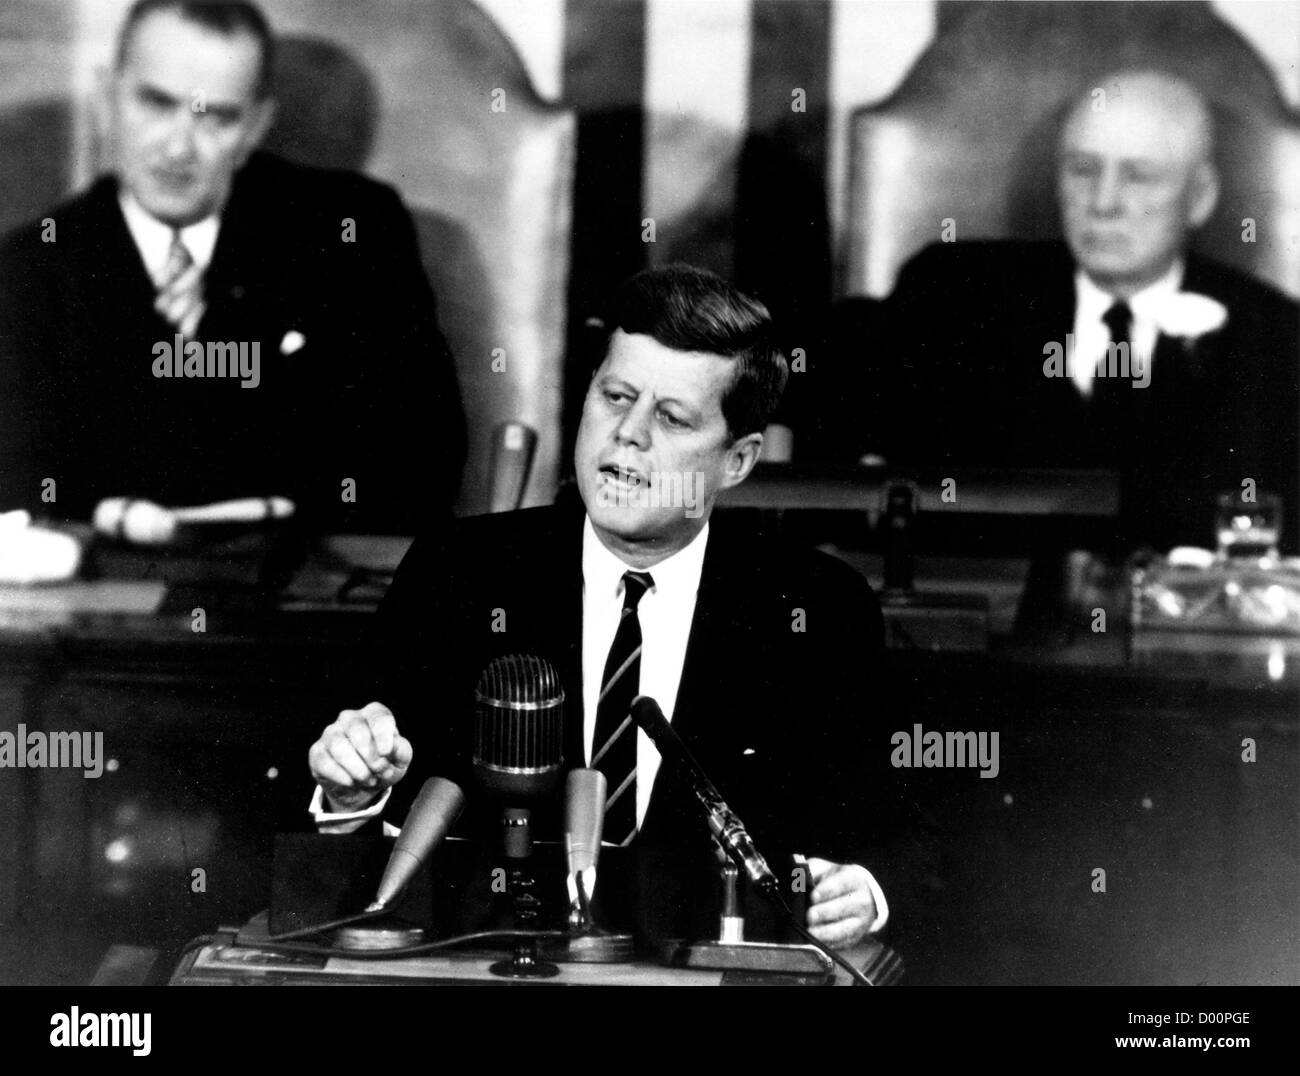 El Presidente John F. Kennedy dando discurso histórico Foto de stock